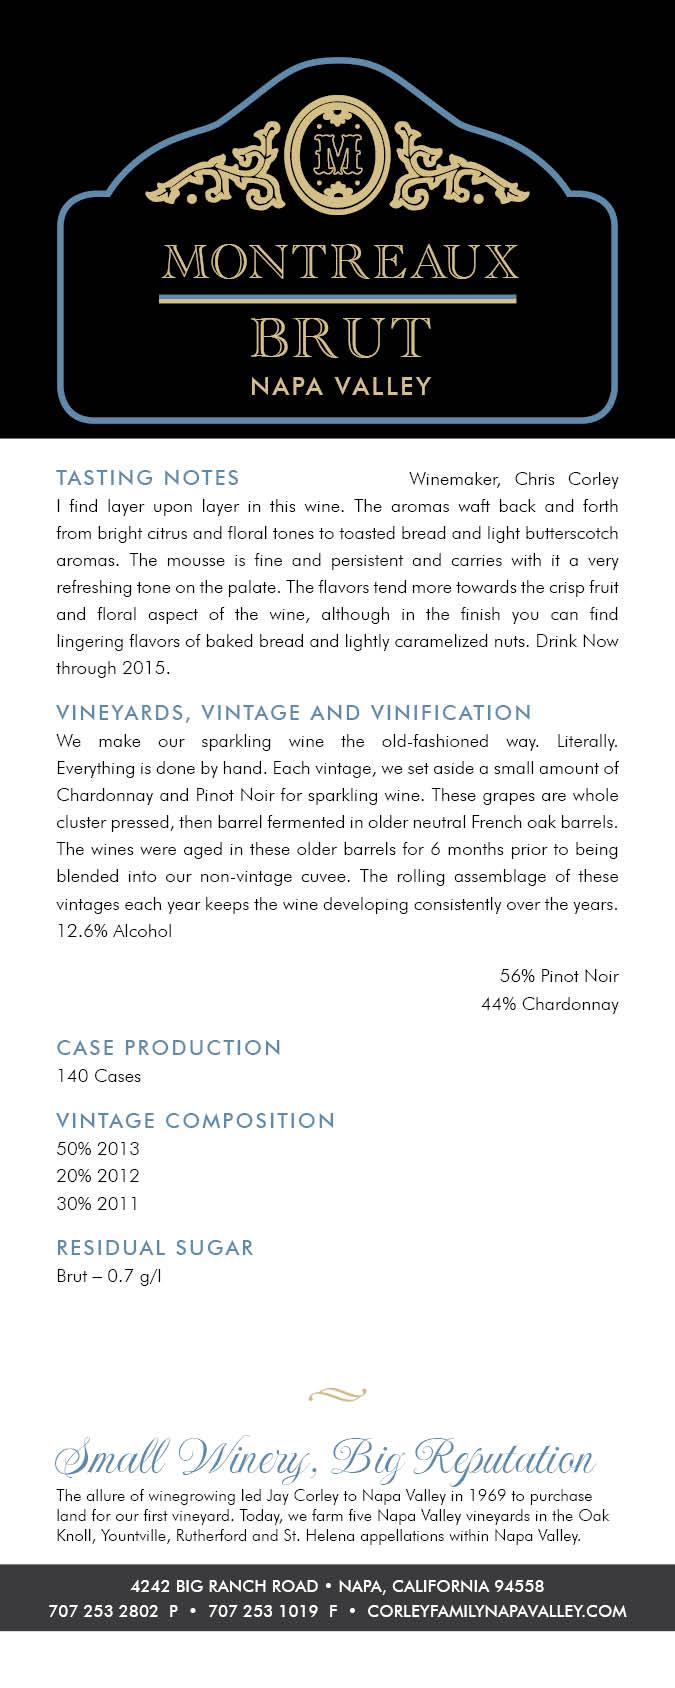 Left_Coast_Marketing_Corley_Design_Tasting_Menu_Wine_002.jpg